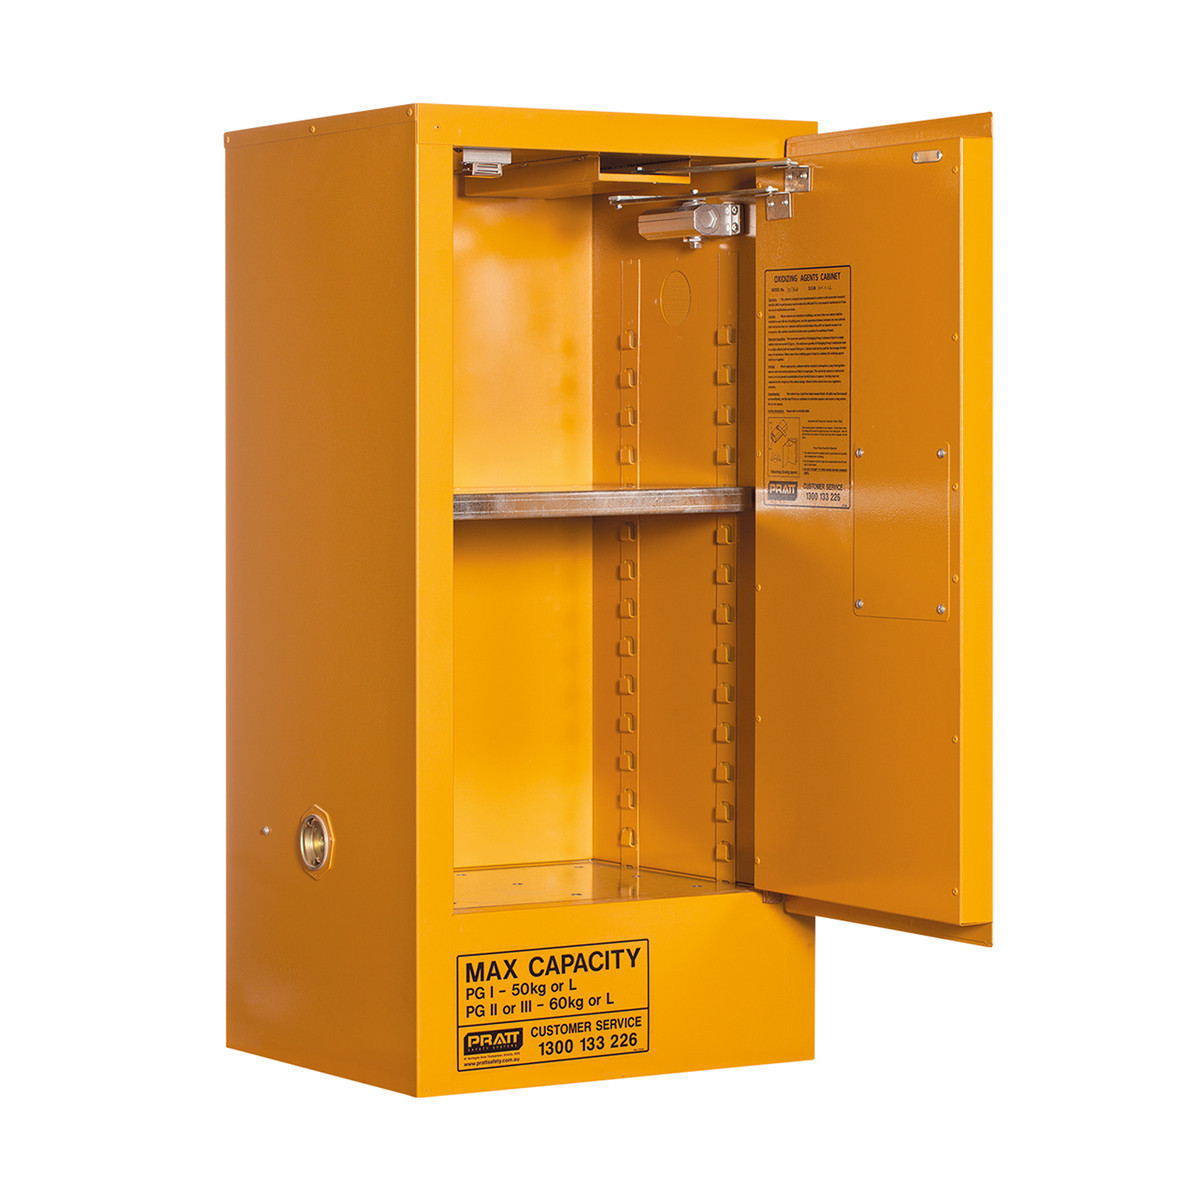 Oxidizing Agent Storage Cabinet 60 Liters - 1 Door, 2 Shelf